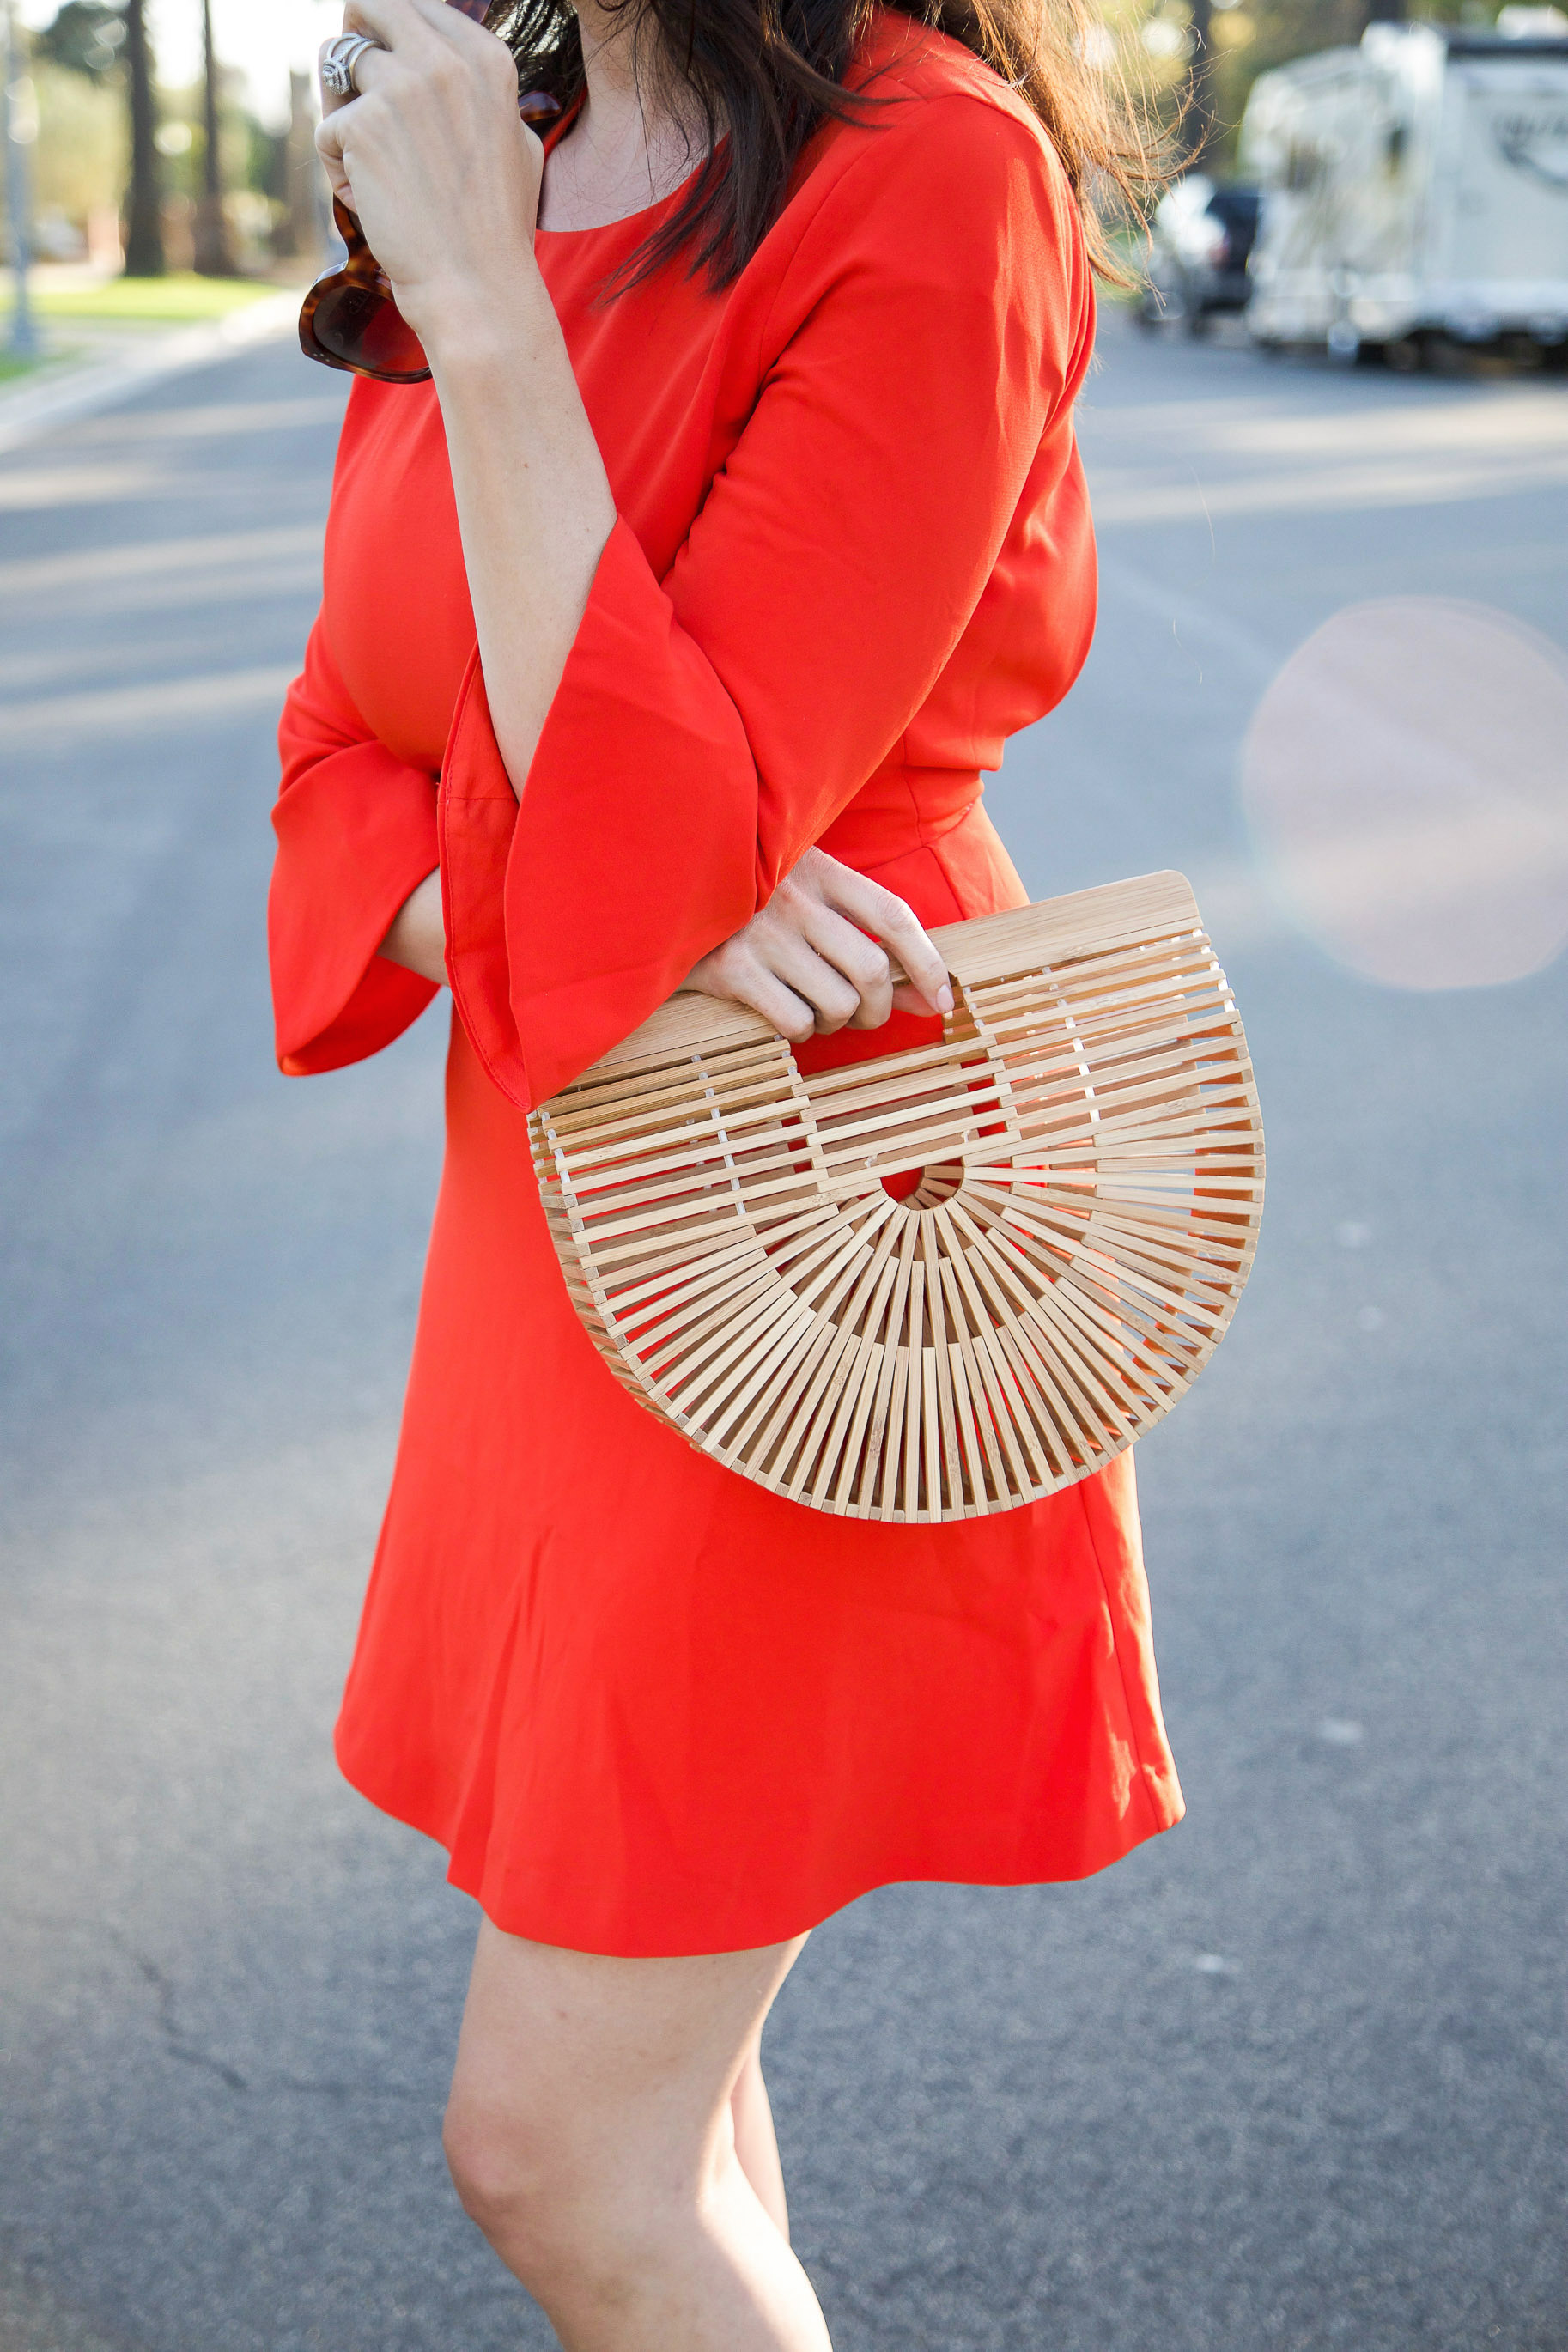 Lucy-Paris-Red-Bell-Sleeved-Dress8.jpg